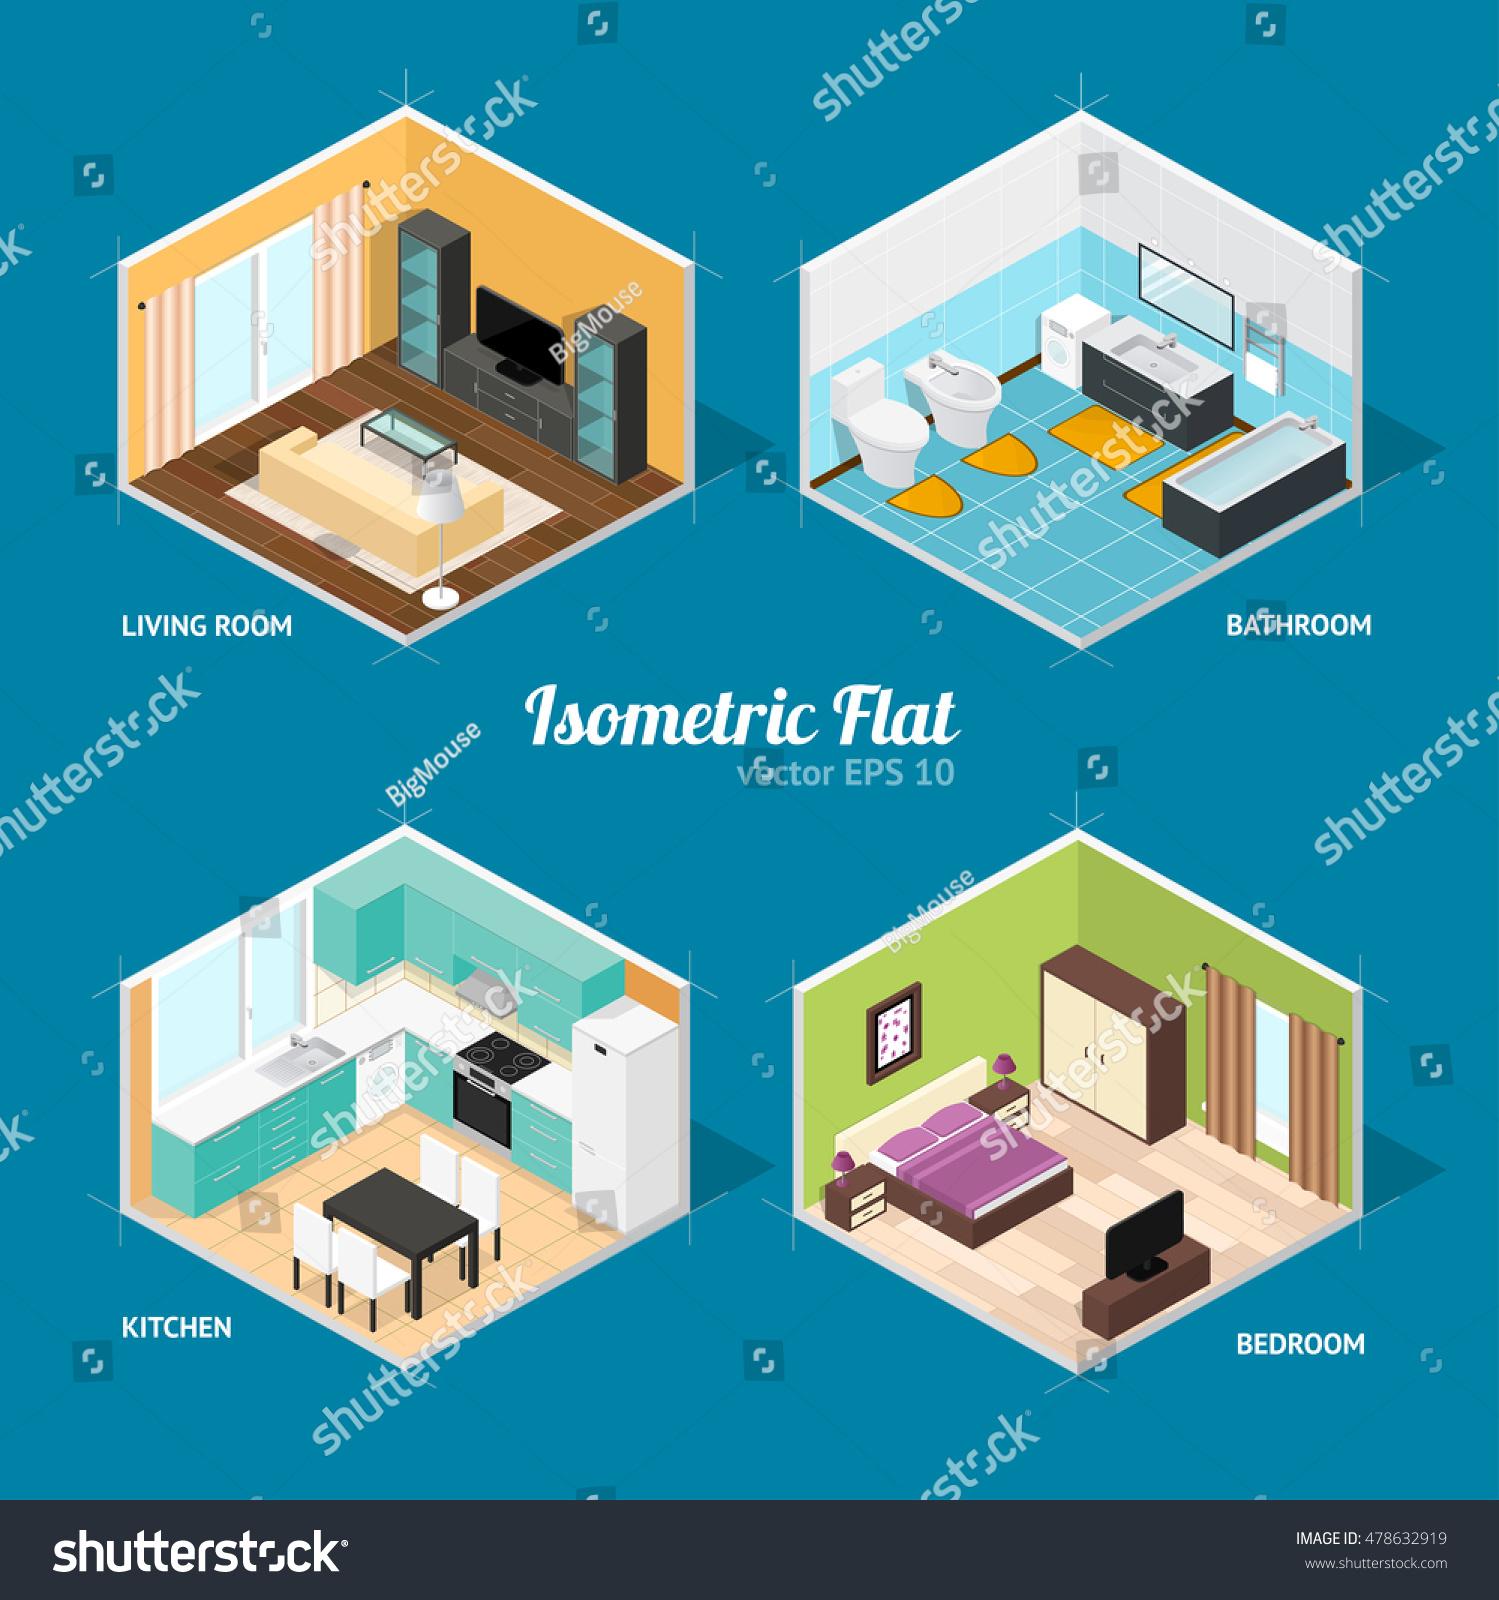 Interior rooms house livingroom bathroom bedroom stock vector interior rooms of the house livingroom bathroom bedroom and kitchen isometric view ccuart Choice Image